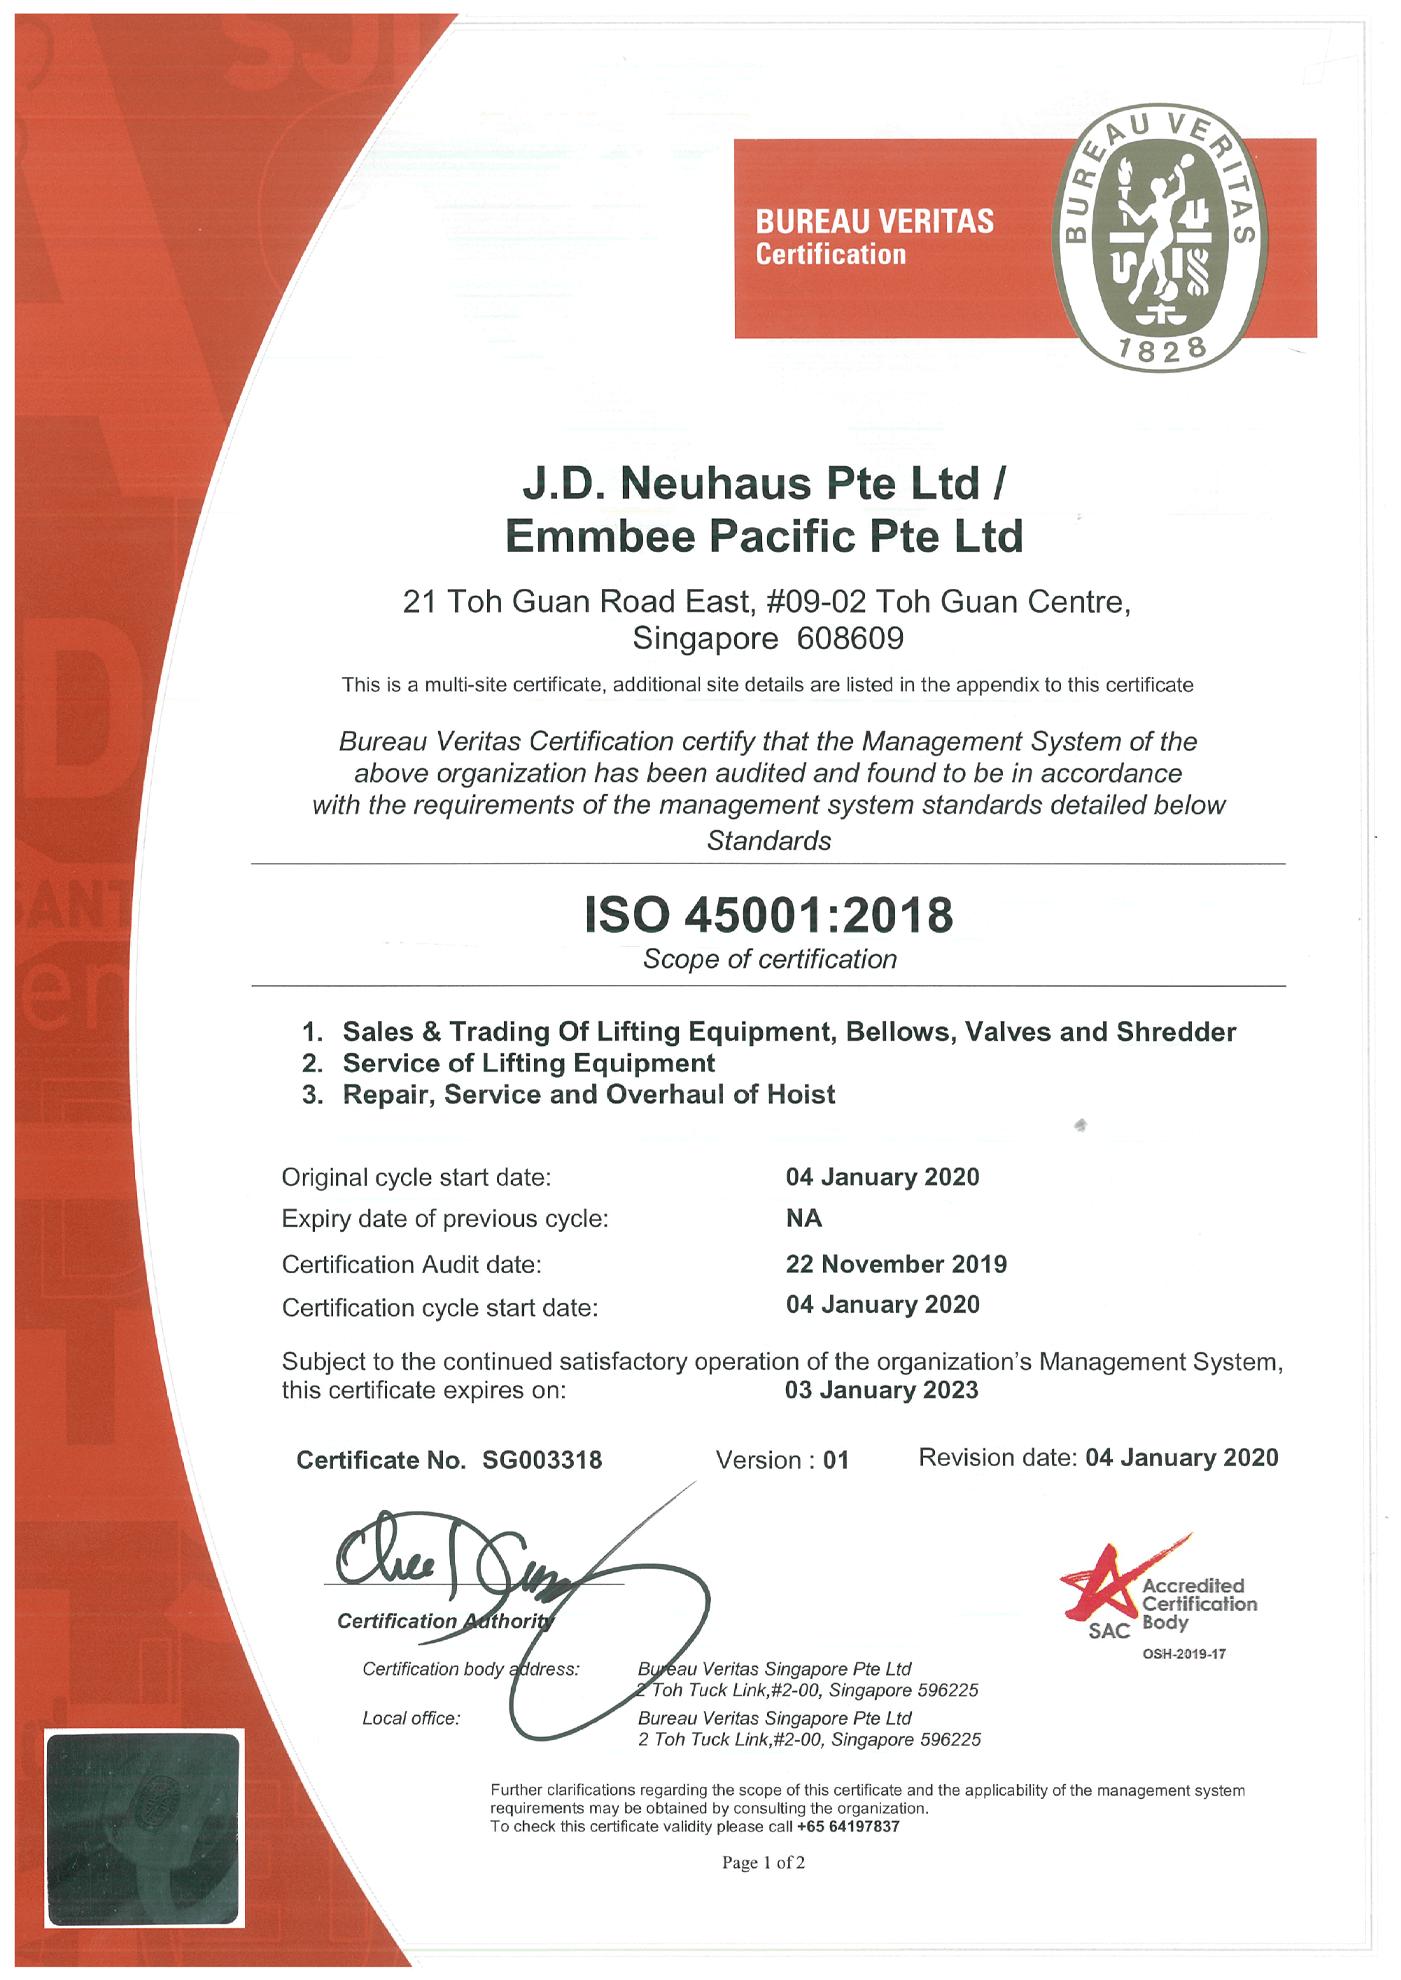 JD Neuhaus Pte Ltd ISO 45001 Certification